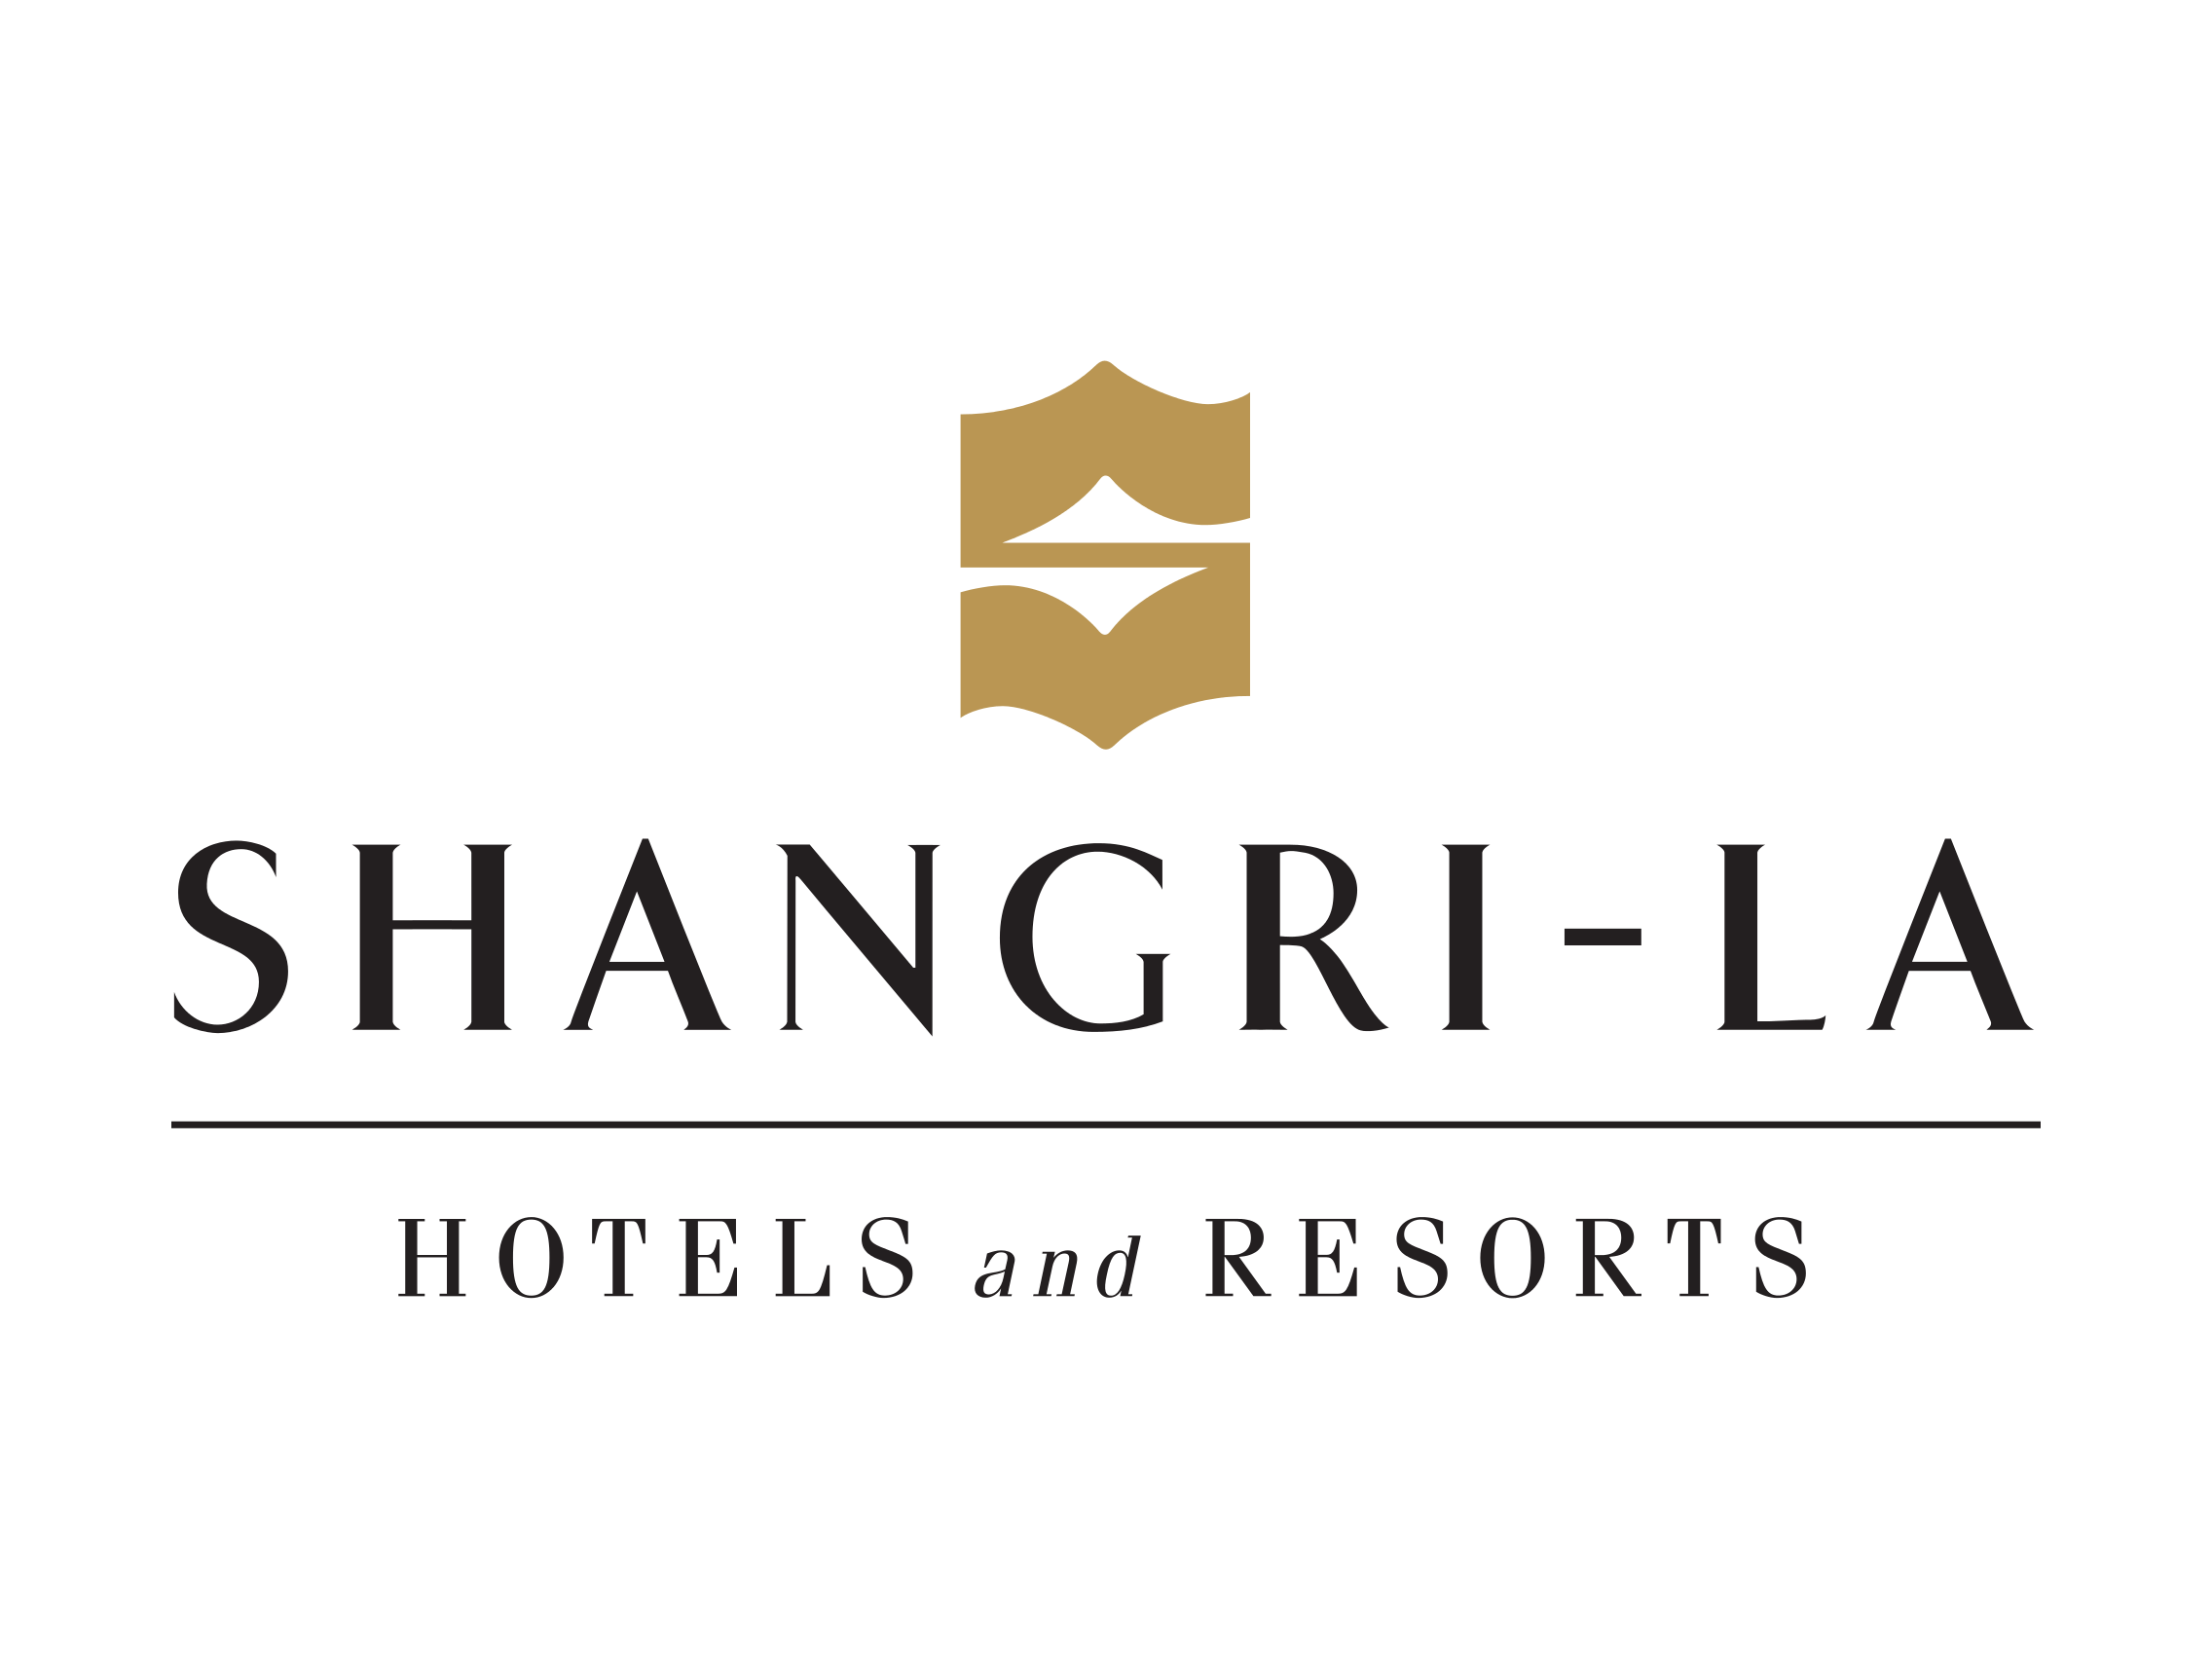 Hotel clipart hotel logo. Google search the logos